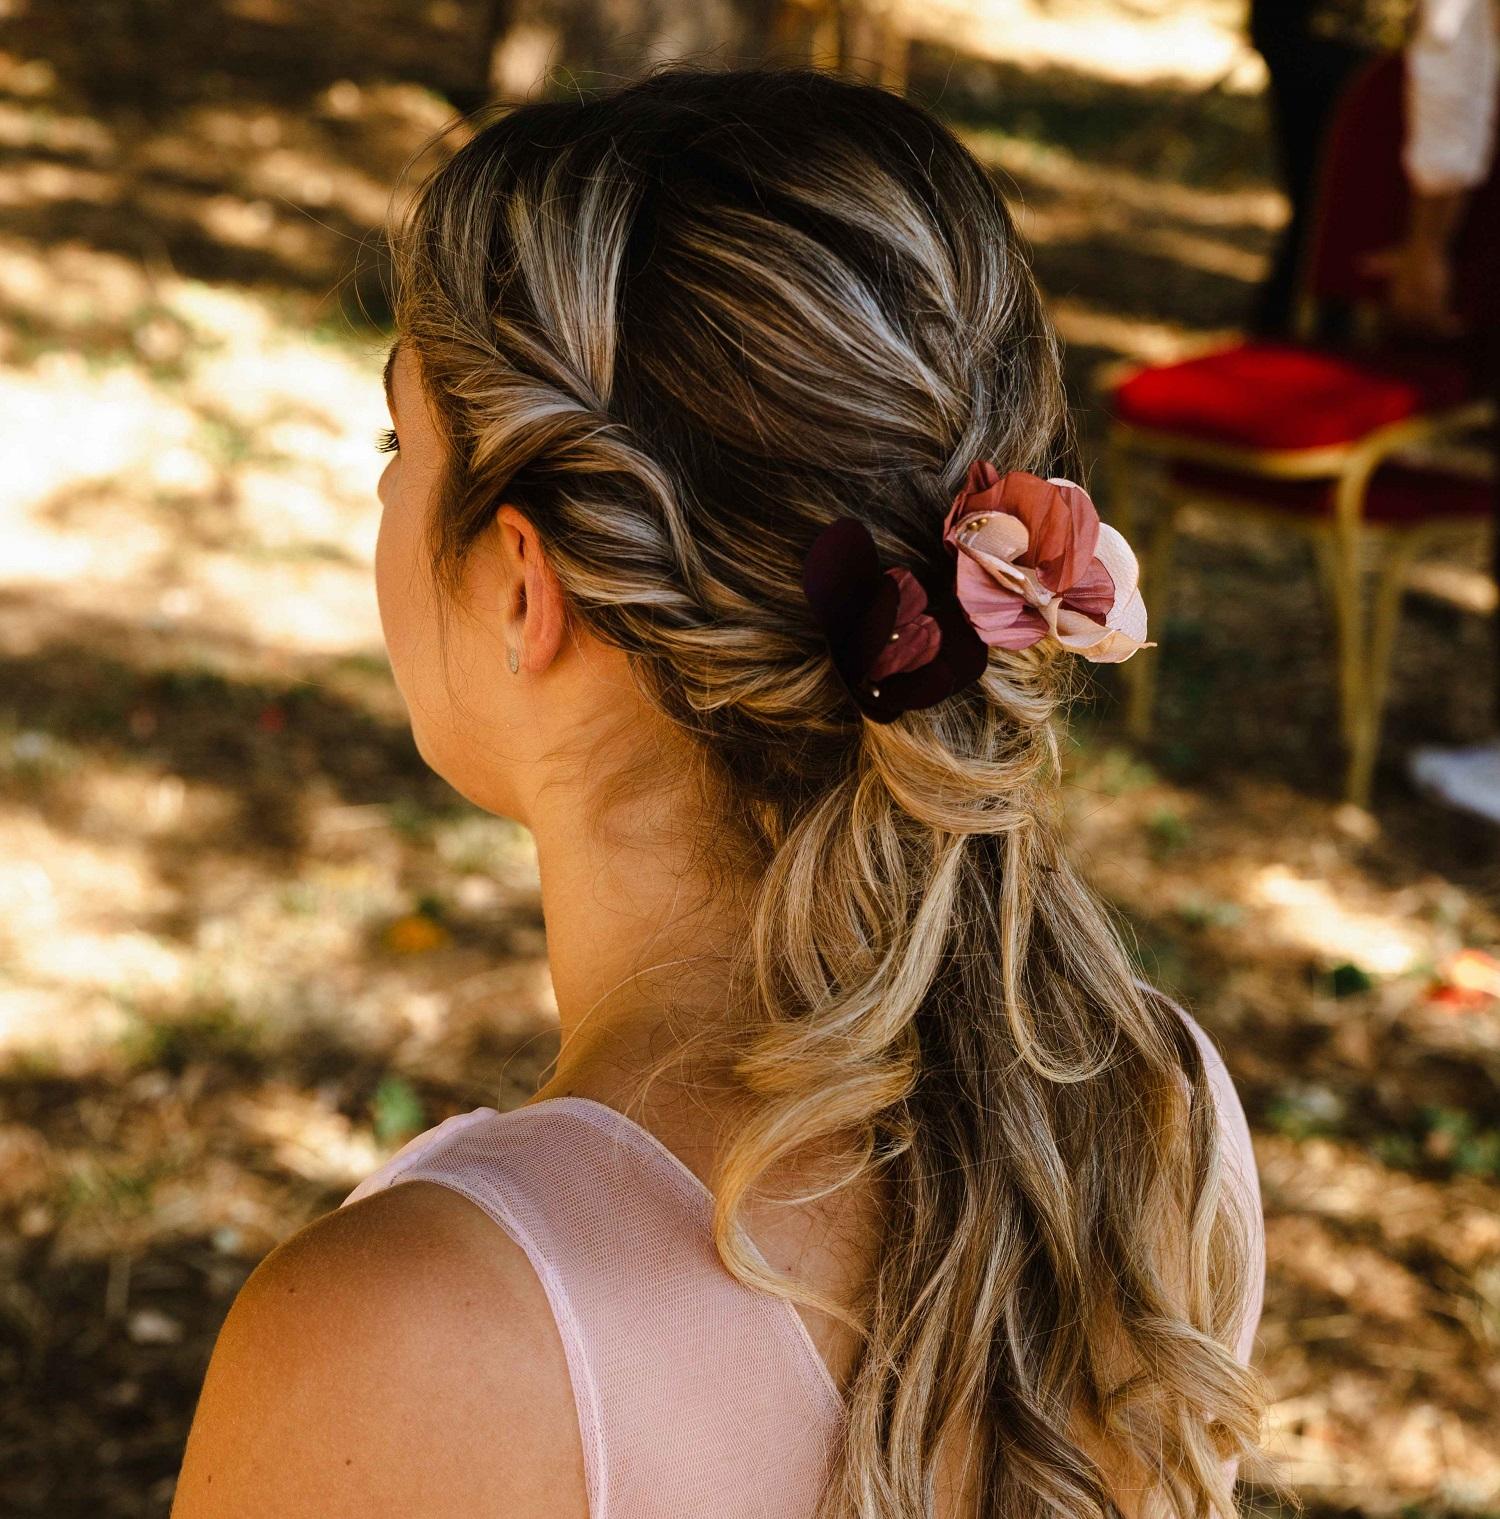 Epingles Valentine couleurs d'automne Alice MARTY Accessoires mariage Toulouse Albi